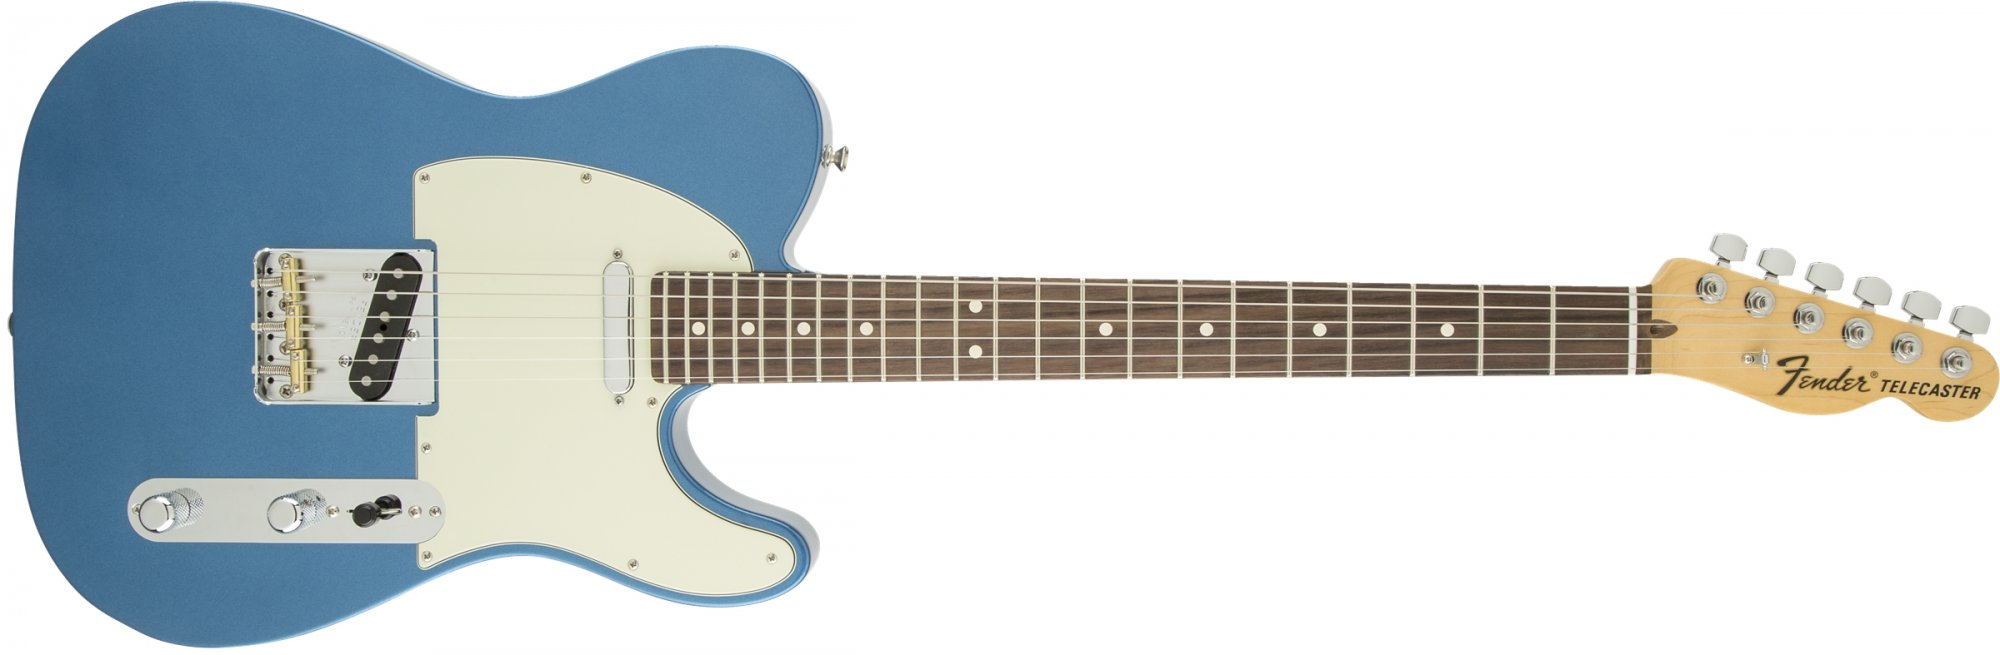 Fender American Special Telecaster RW Lake Placid Blue